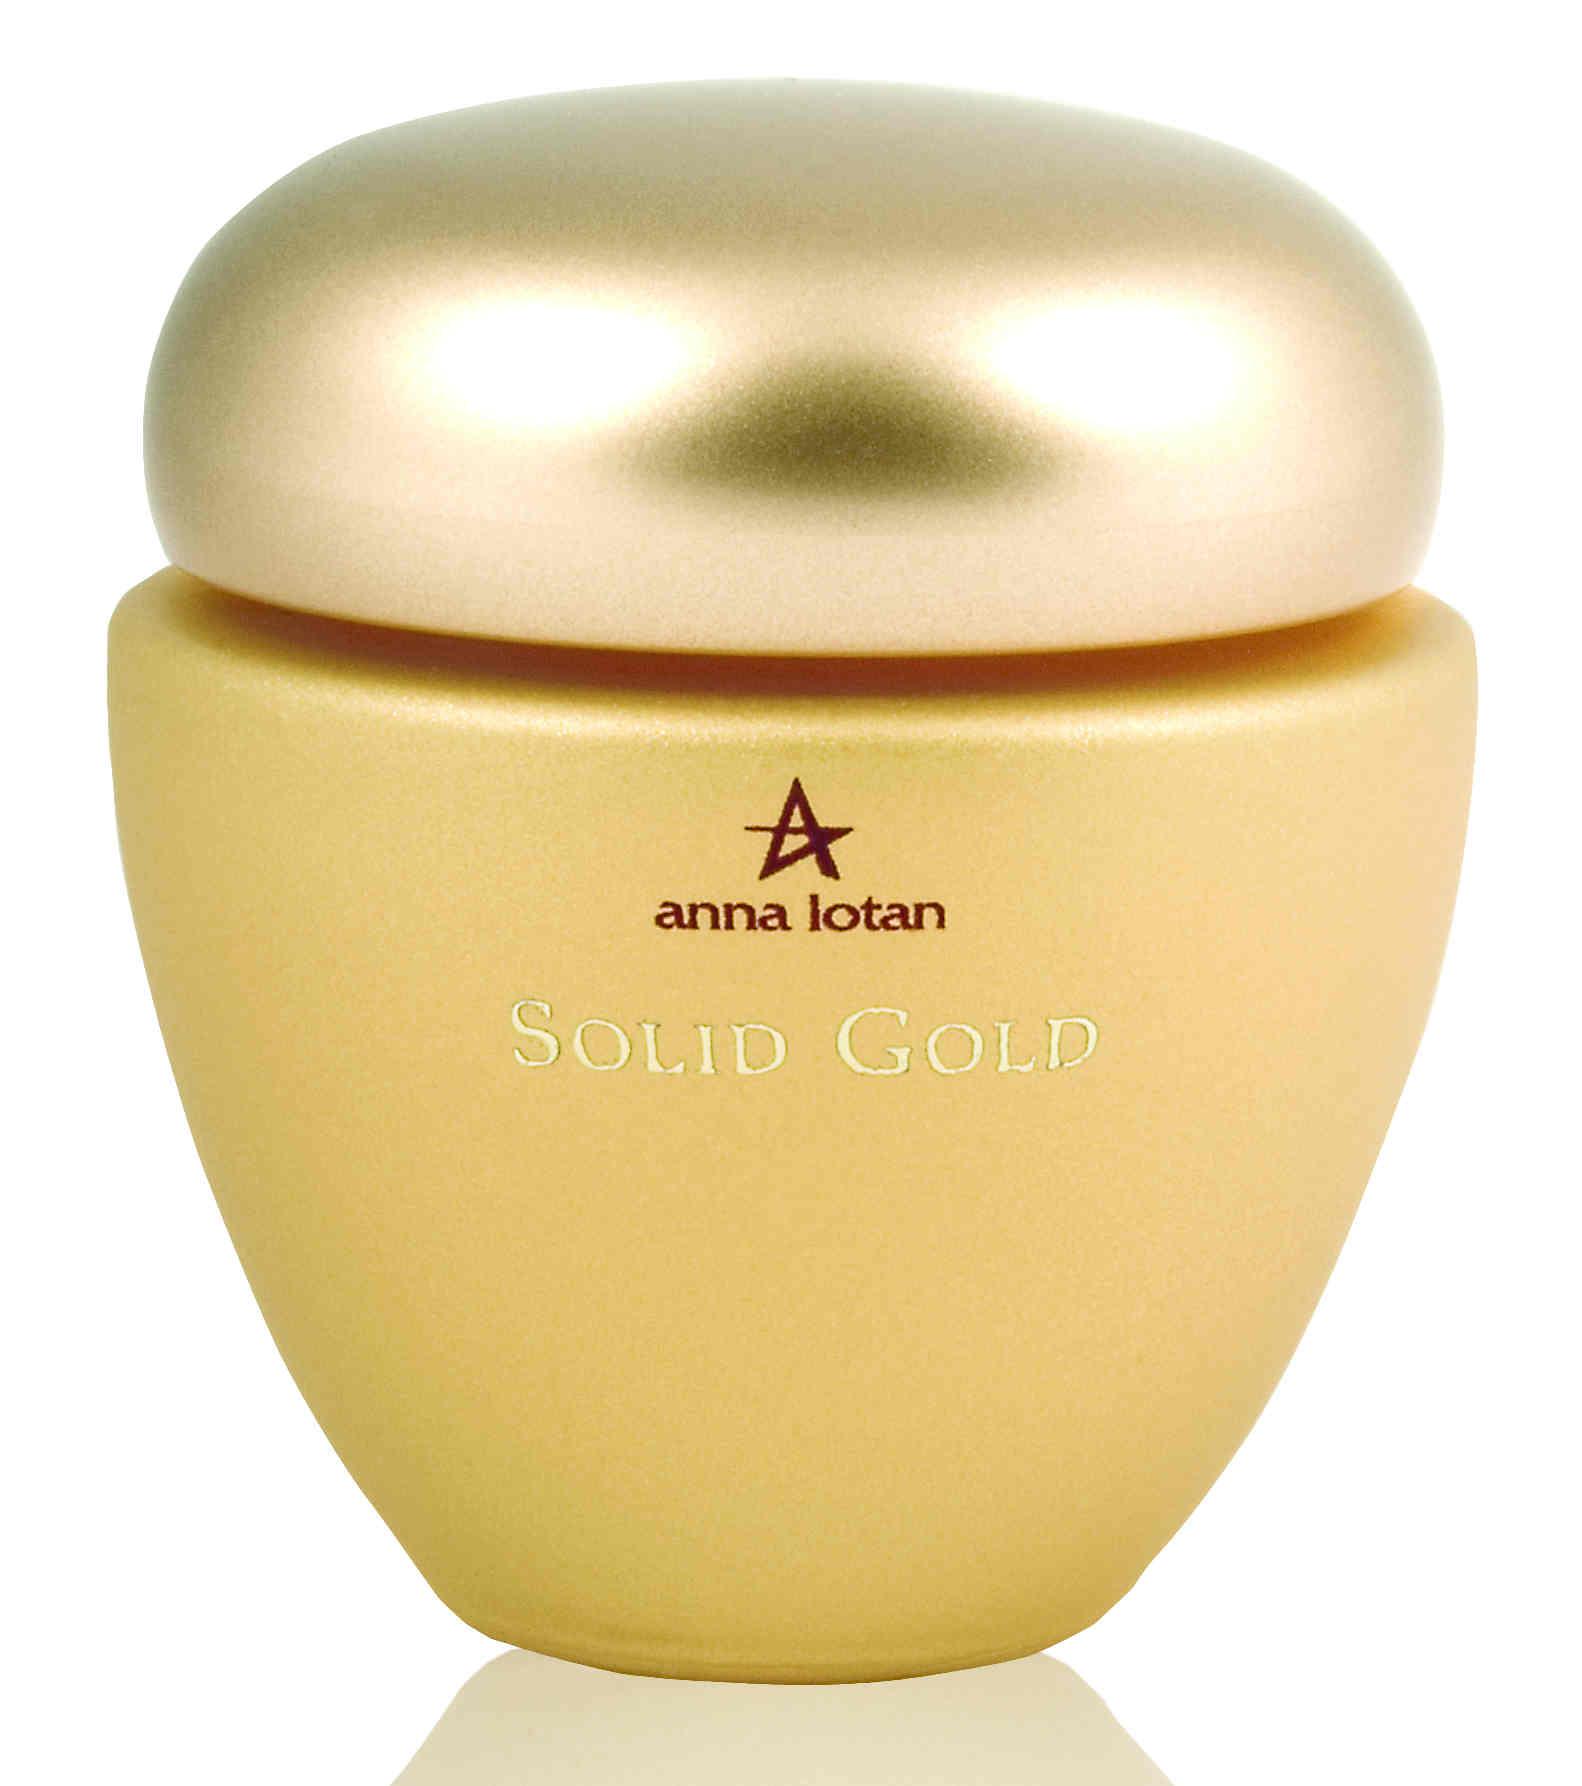 Anna Lotan Liquid Gold Solid Gold Intensive Care 30 ml - Best Israeli cosmetics